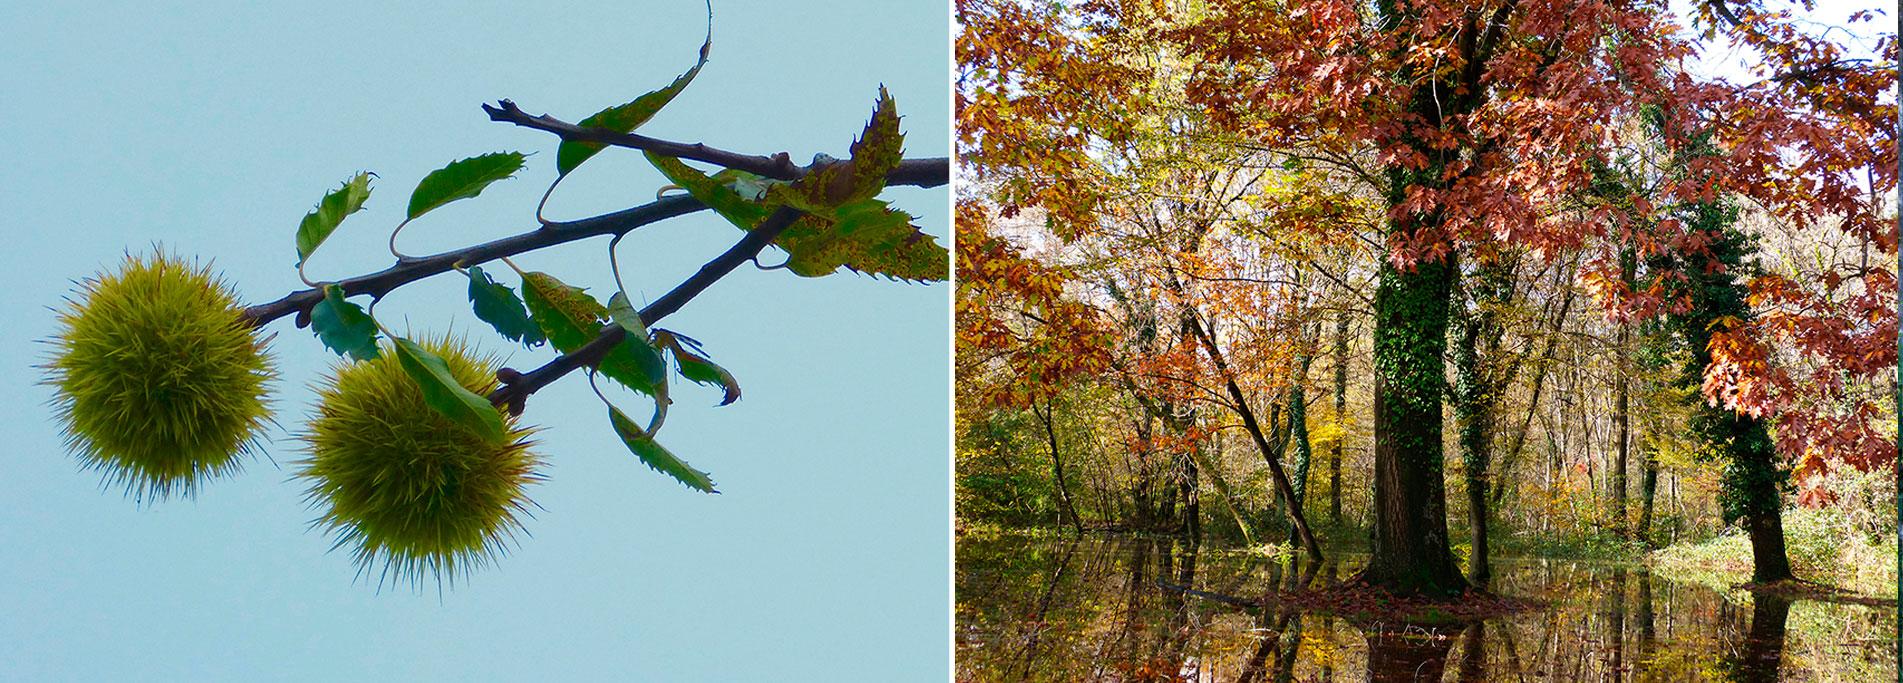 Foliage, collage e...caldarroste